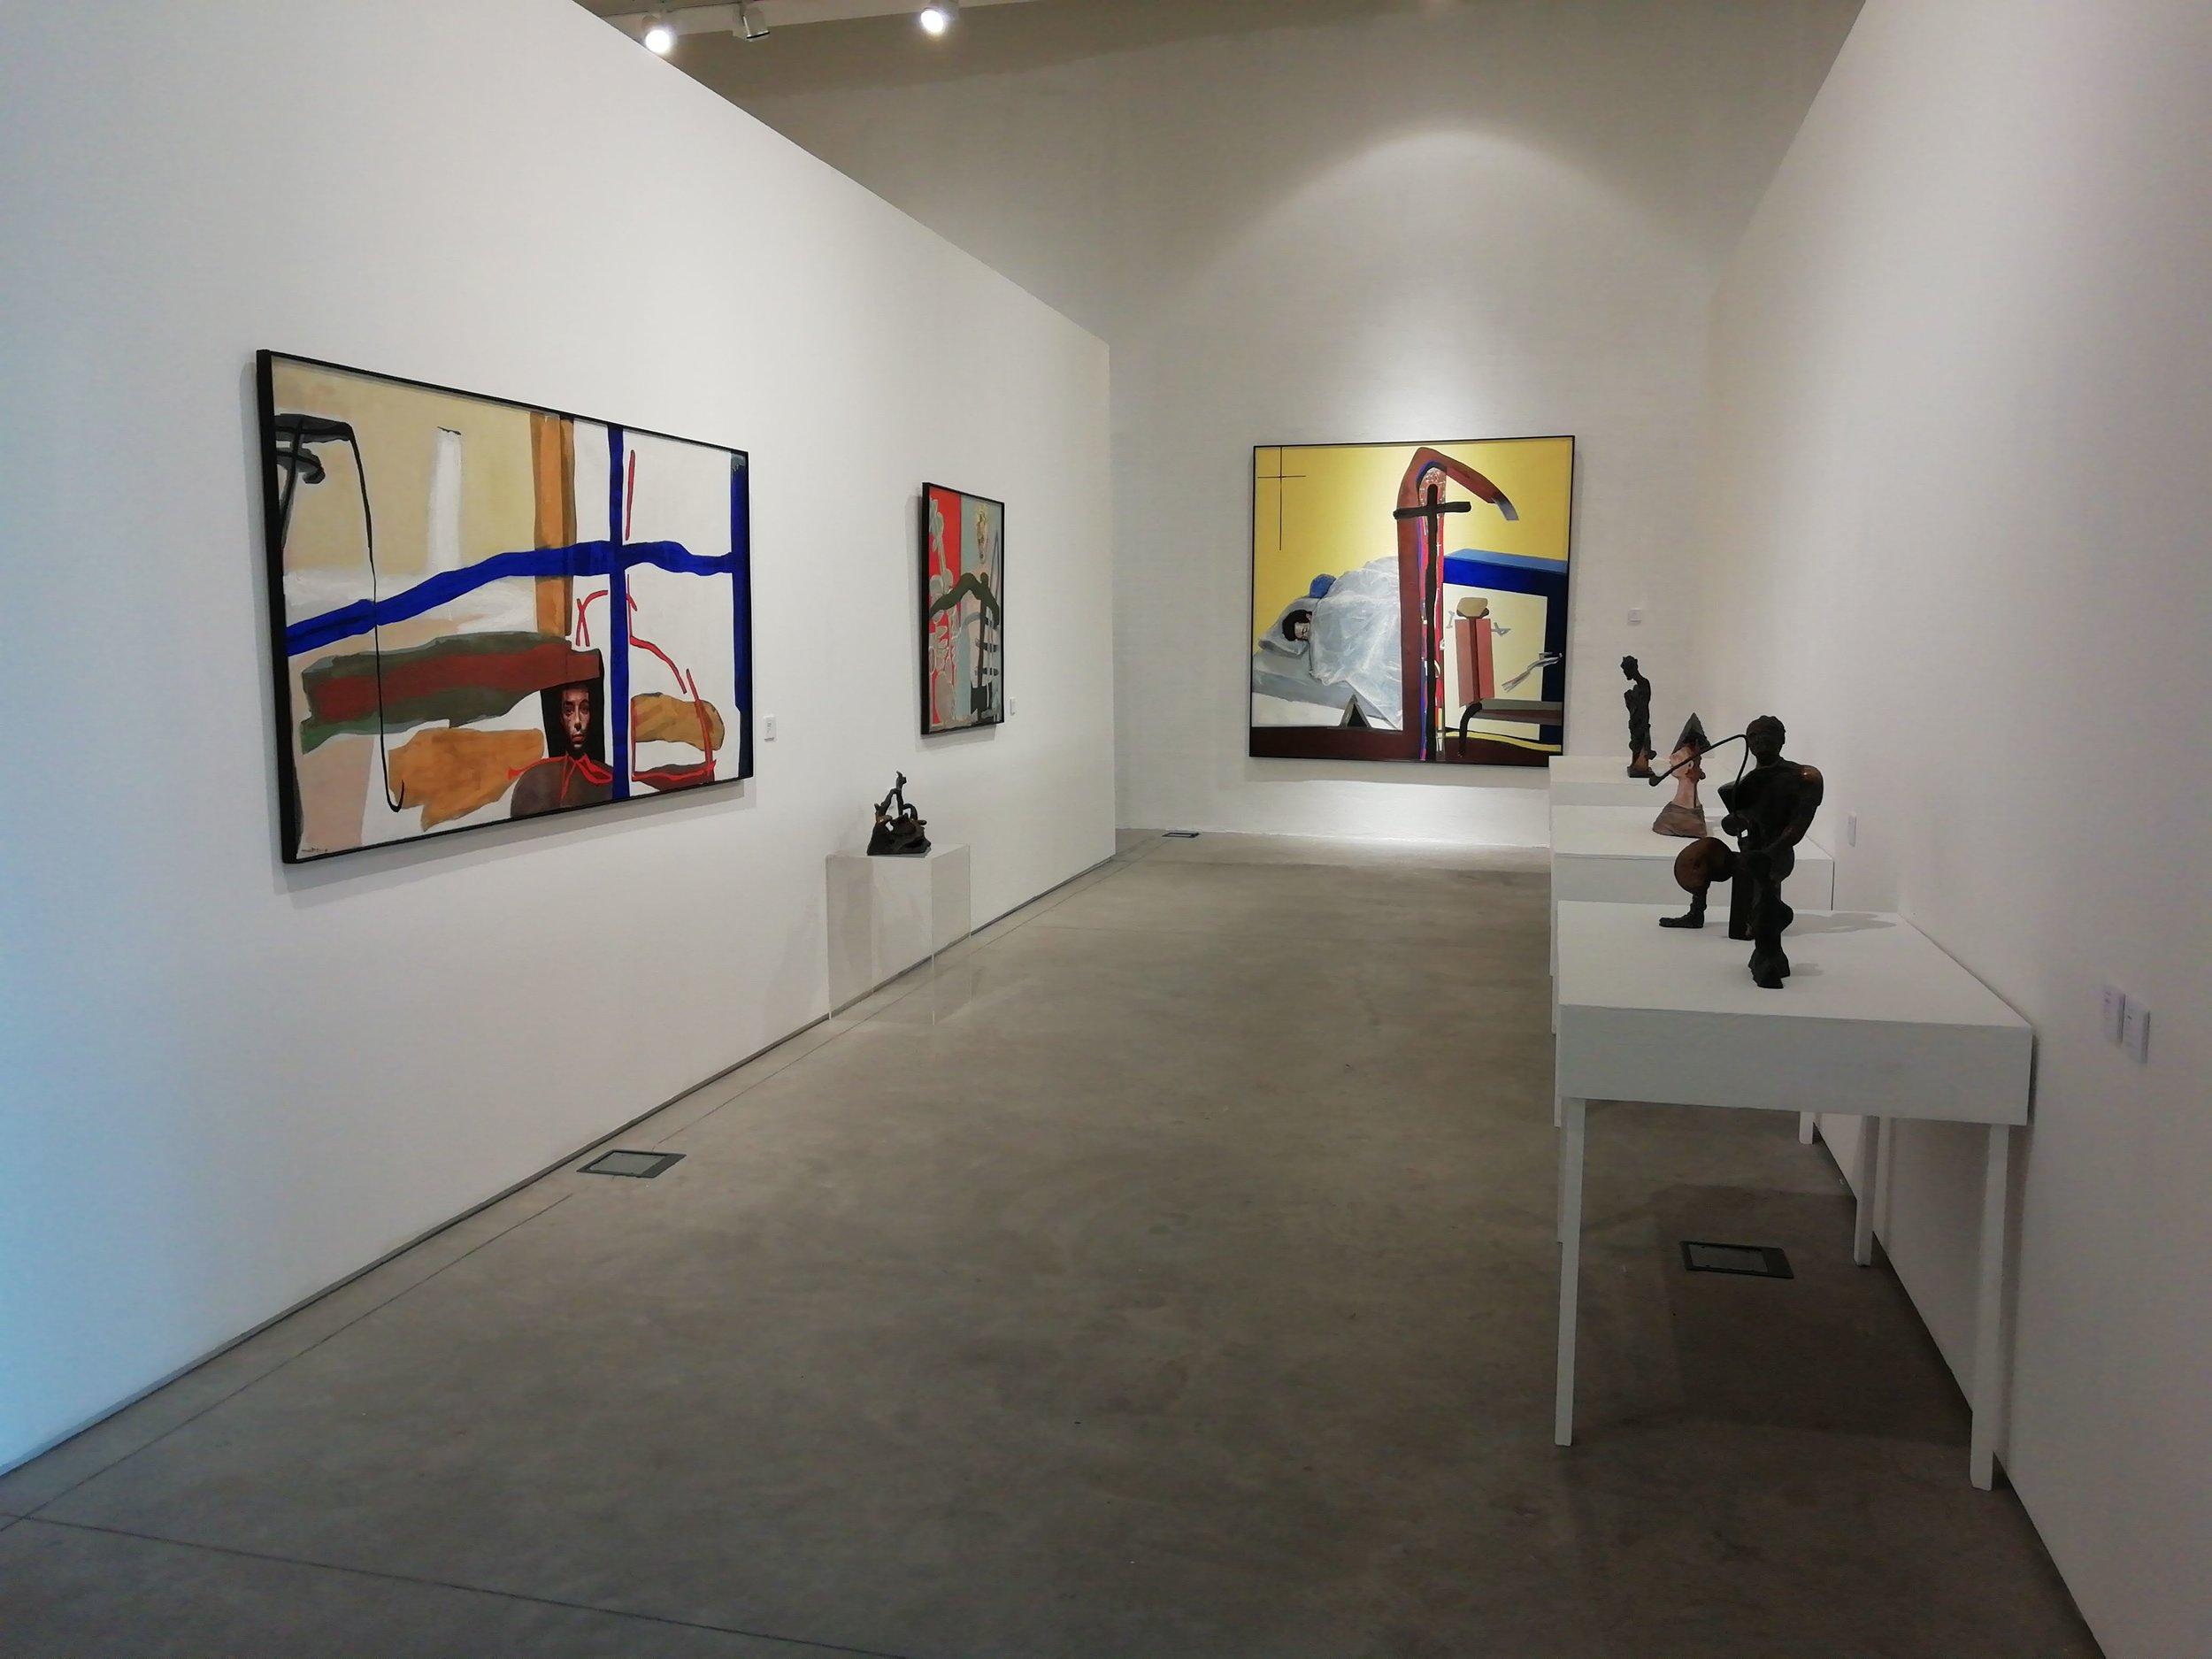 February-April 2019: Arranz-Bravo in Cadaquéz - an exhibition at the Arranz-Bravo Foundation